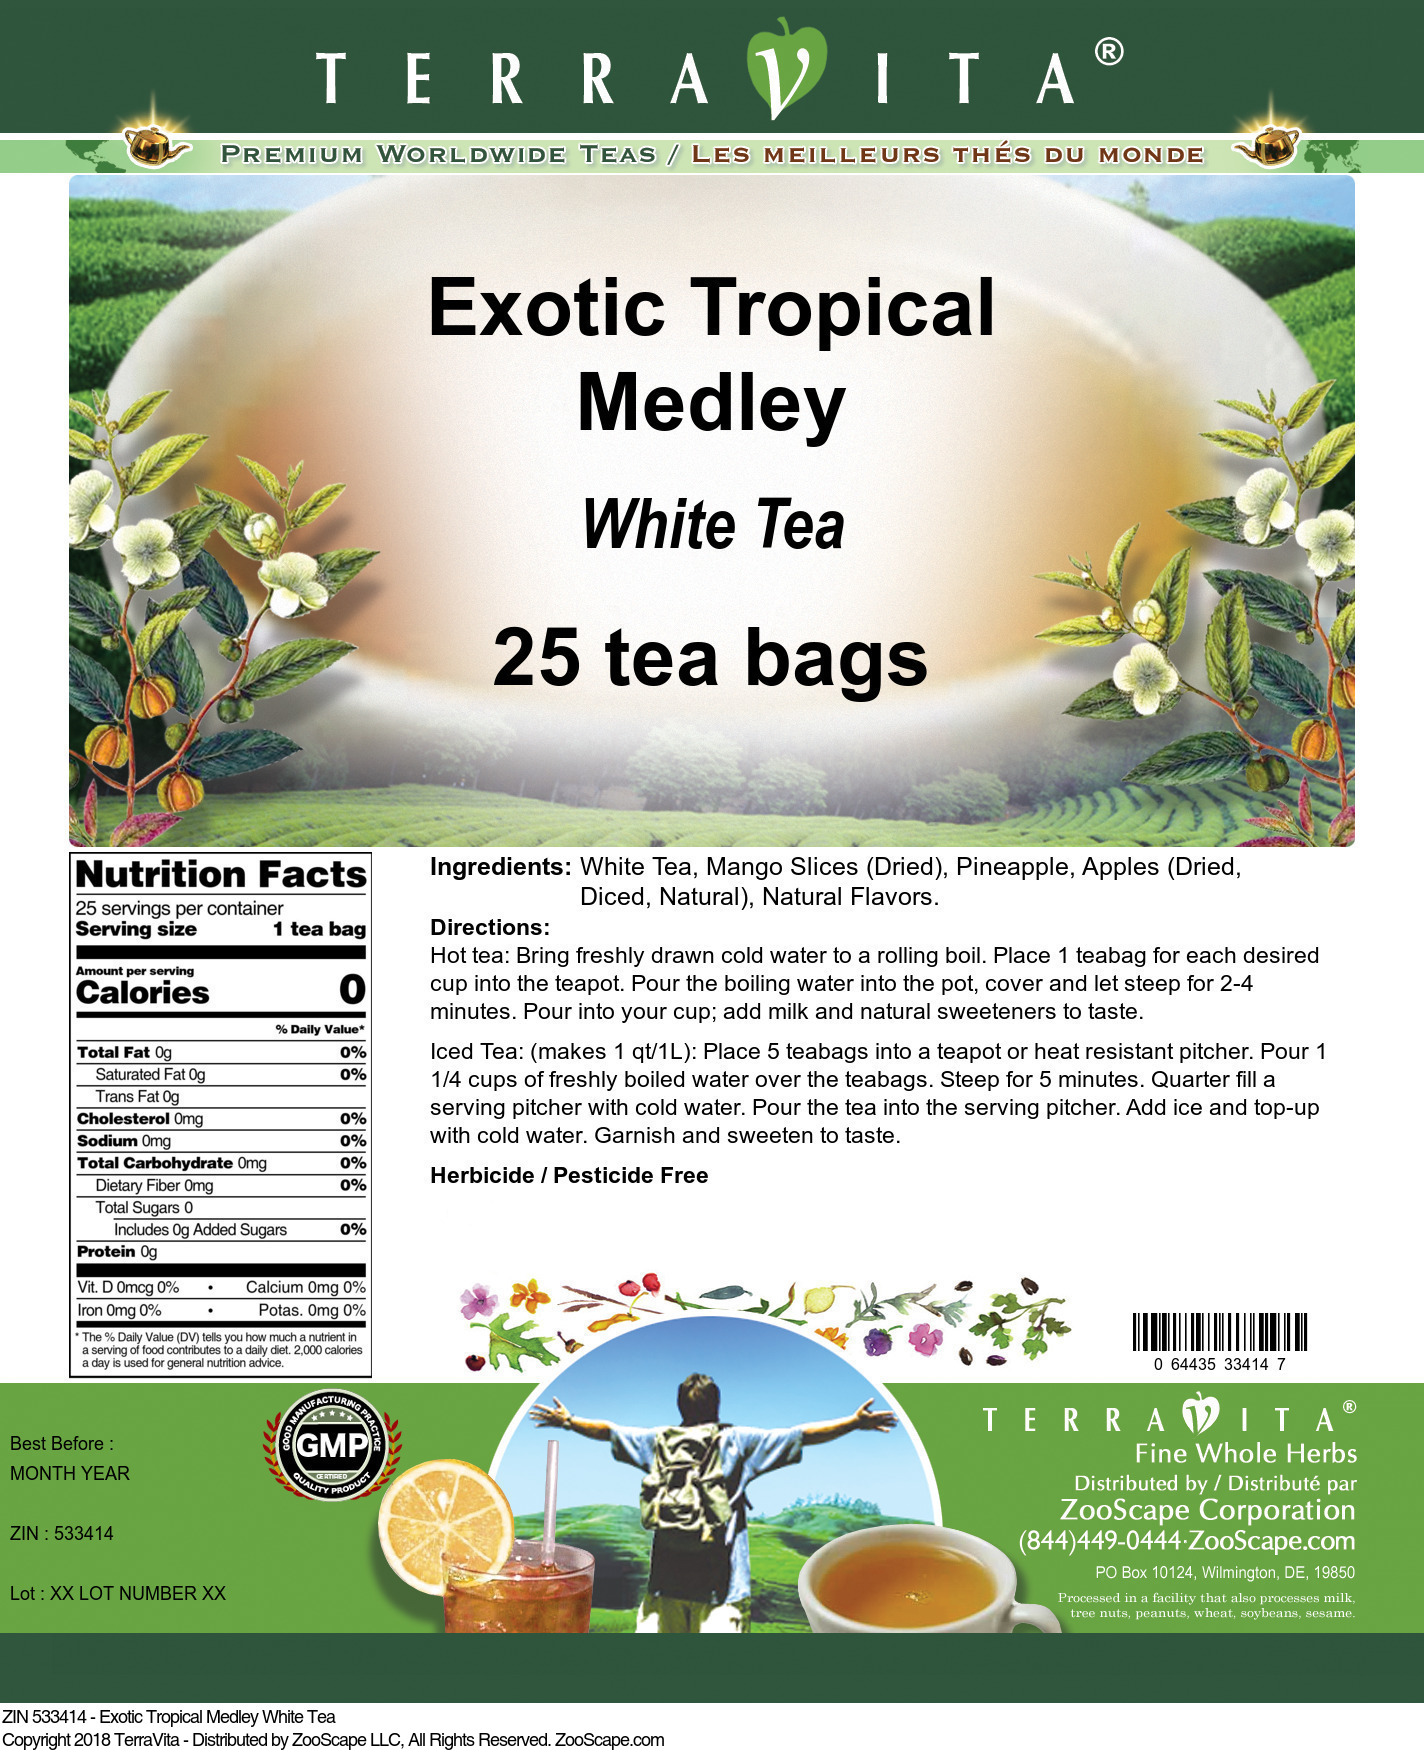 Exotic Tropical Medley White Tea